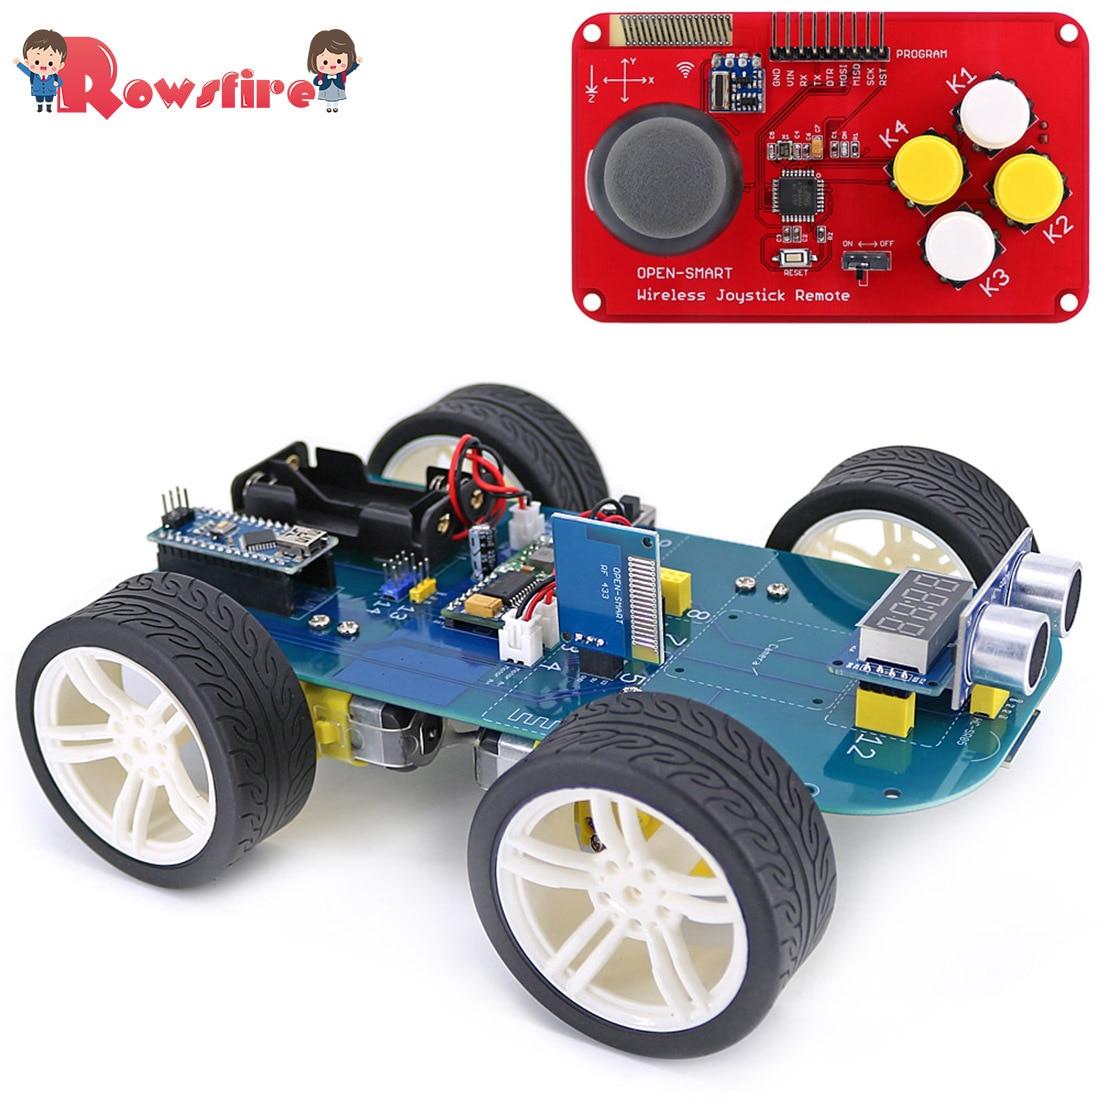 New 4wd 315/433mhz Wireless Joystick Remote Control Rubber Wheel Gear Motor Smart Car Kit For Arduino High-tech Programmable Toy